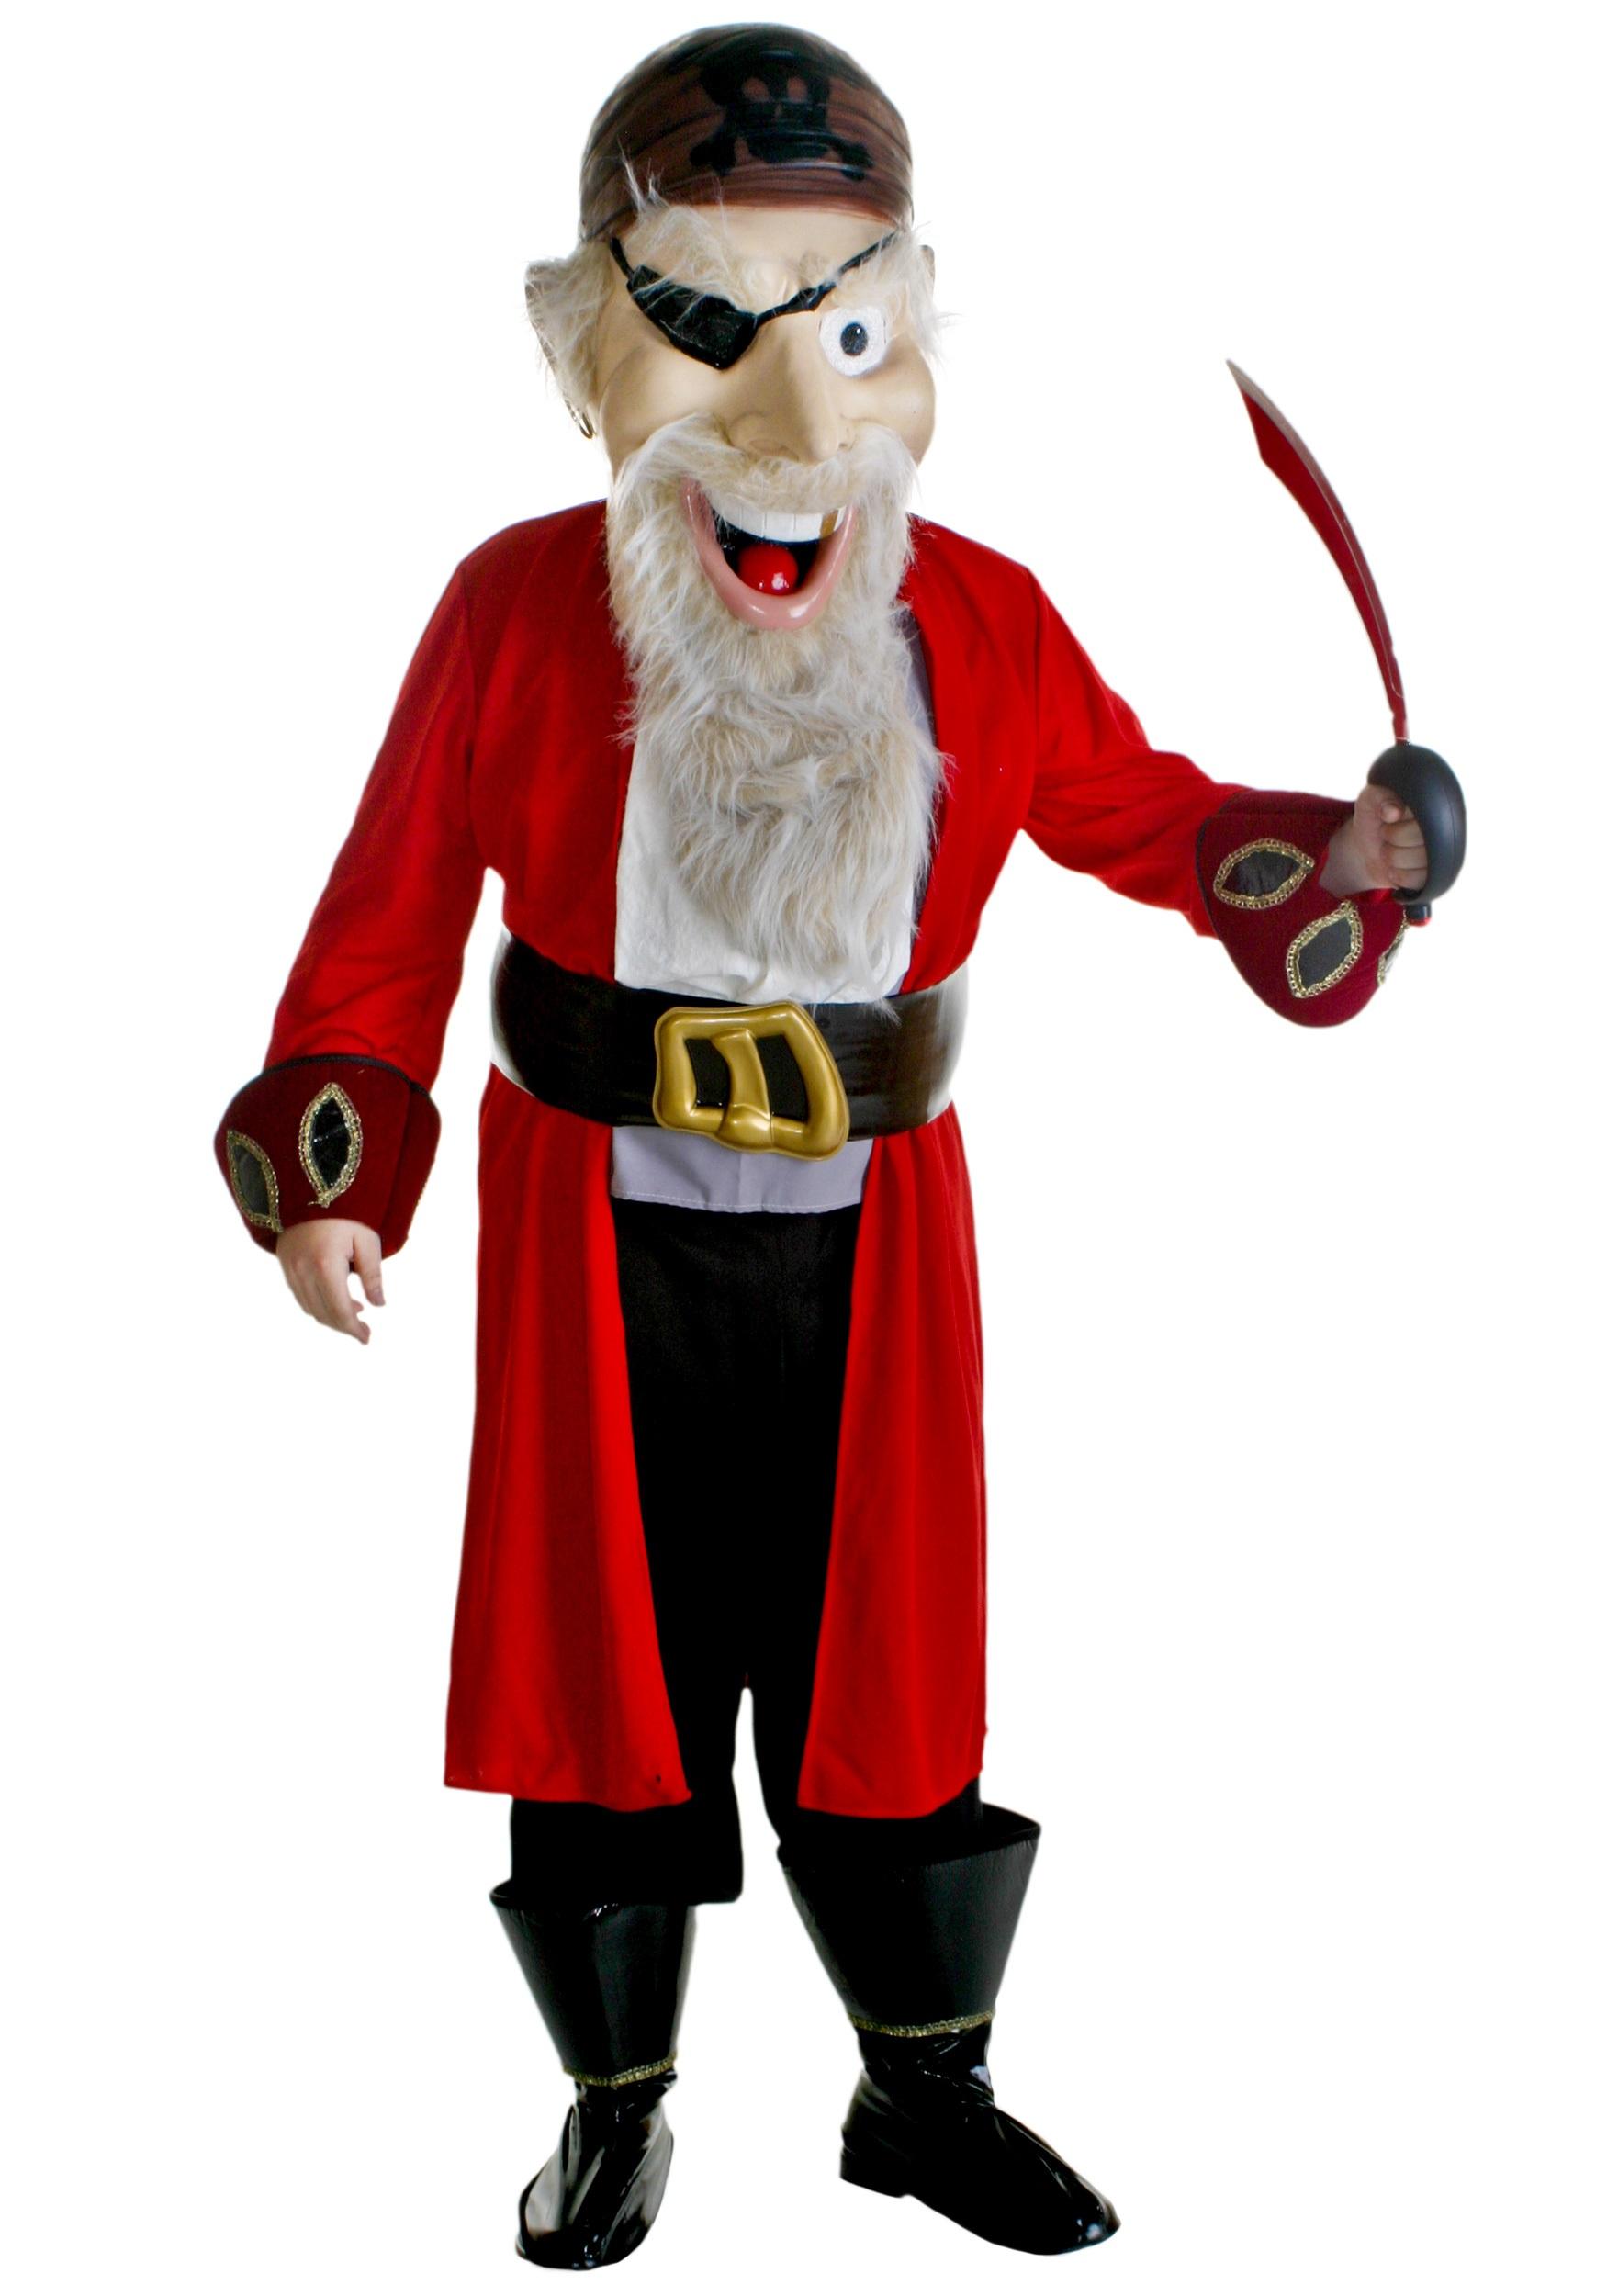 Pirate Mascot Costume  sc 1 st  Costumes Galore & Pirate Mascot Costume - Halloween Mascot Costumes